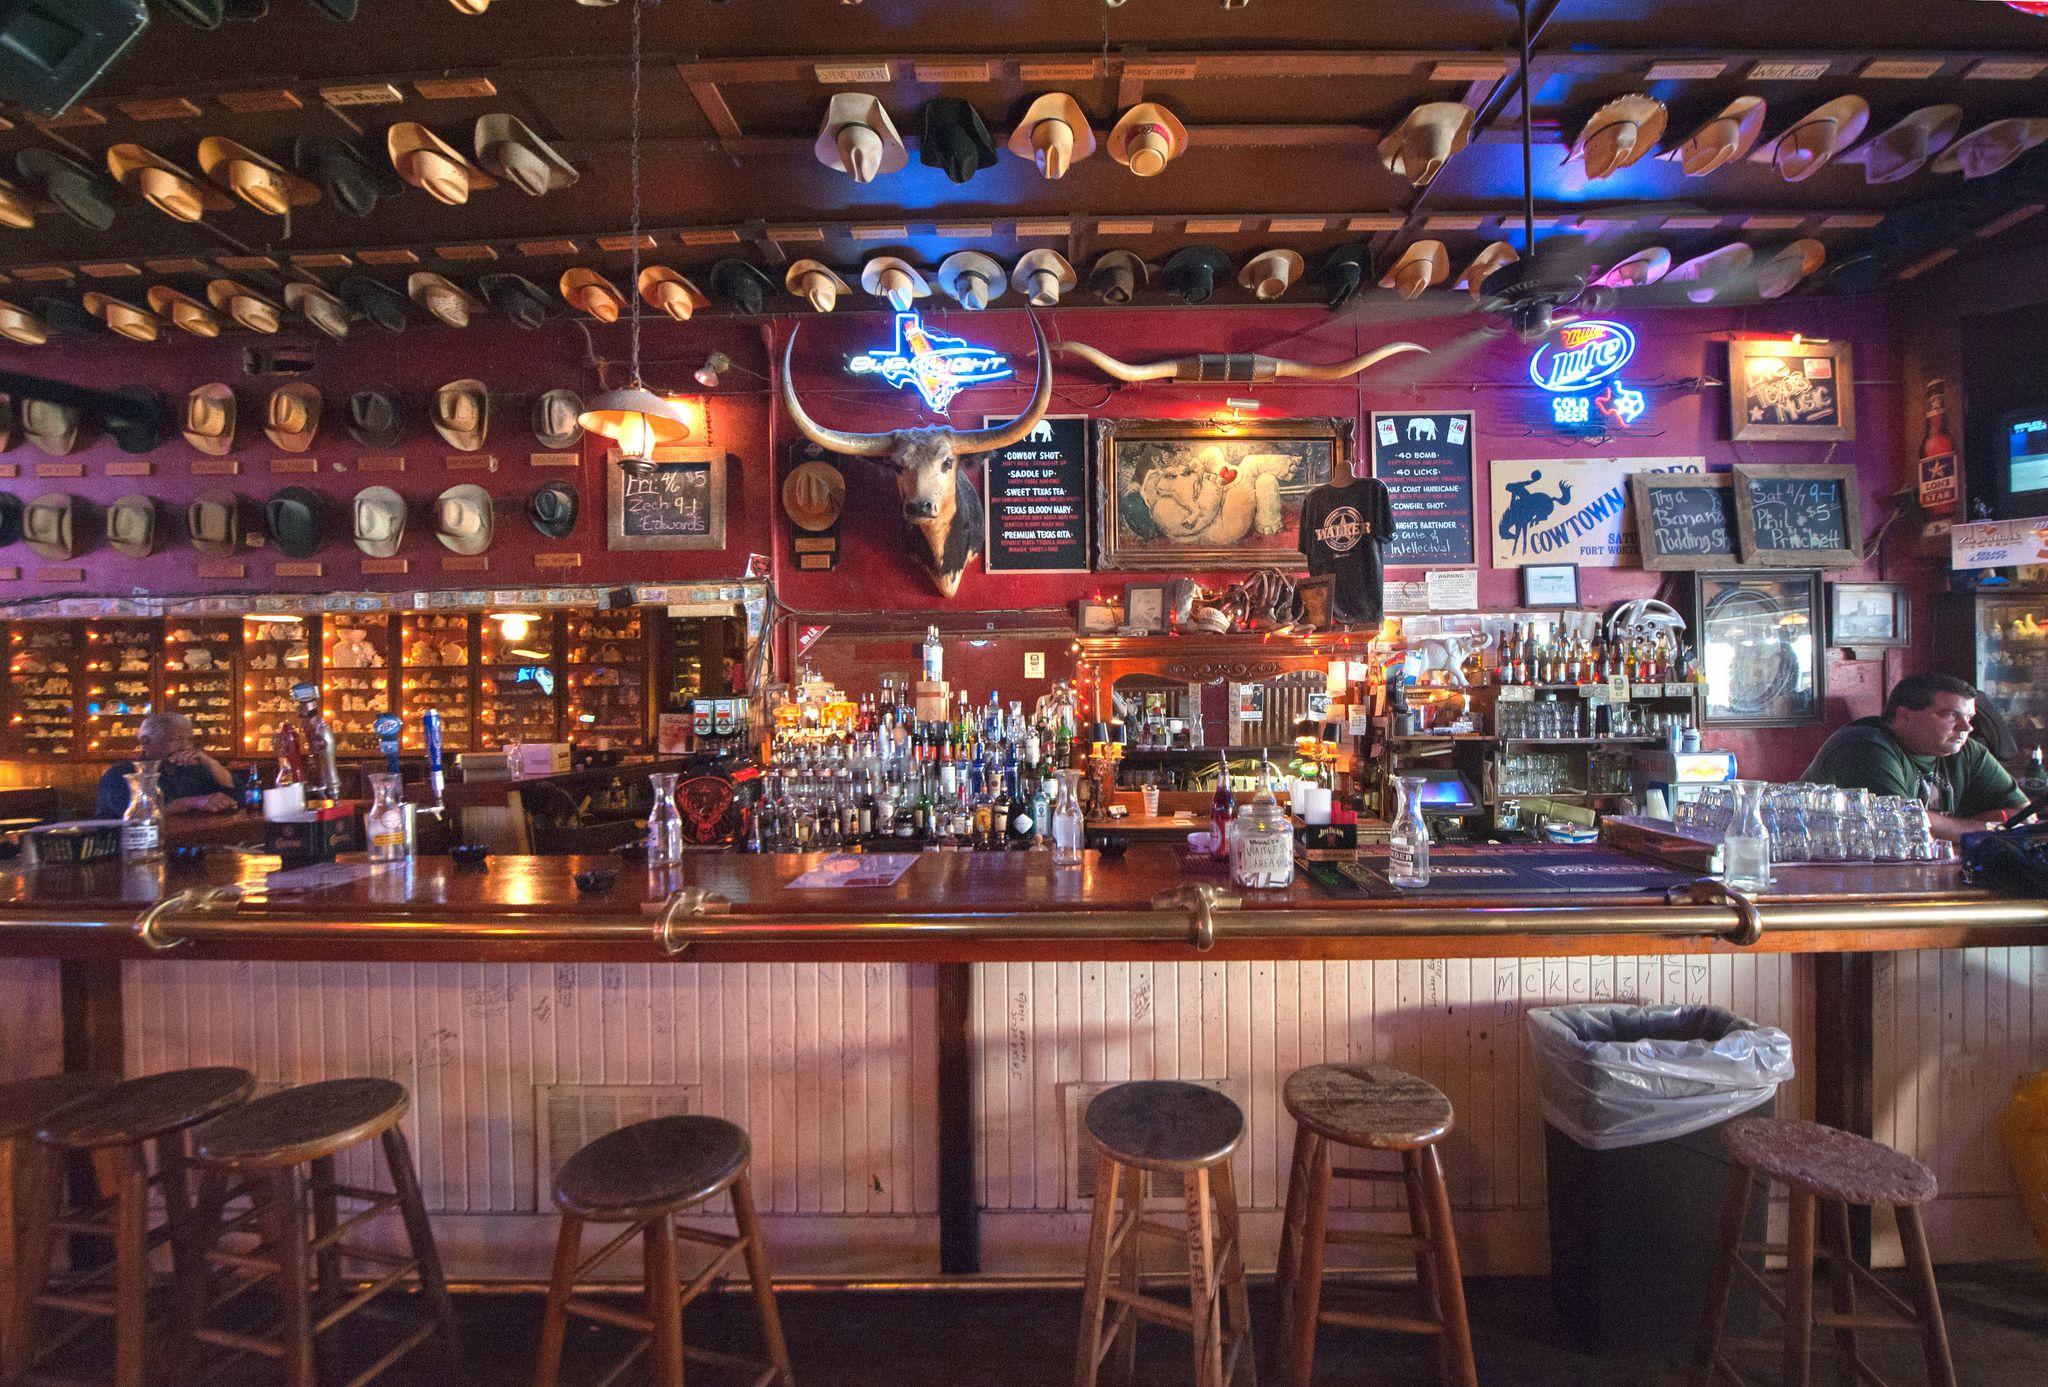 The White Elephant Saloon